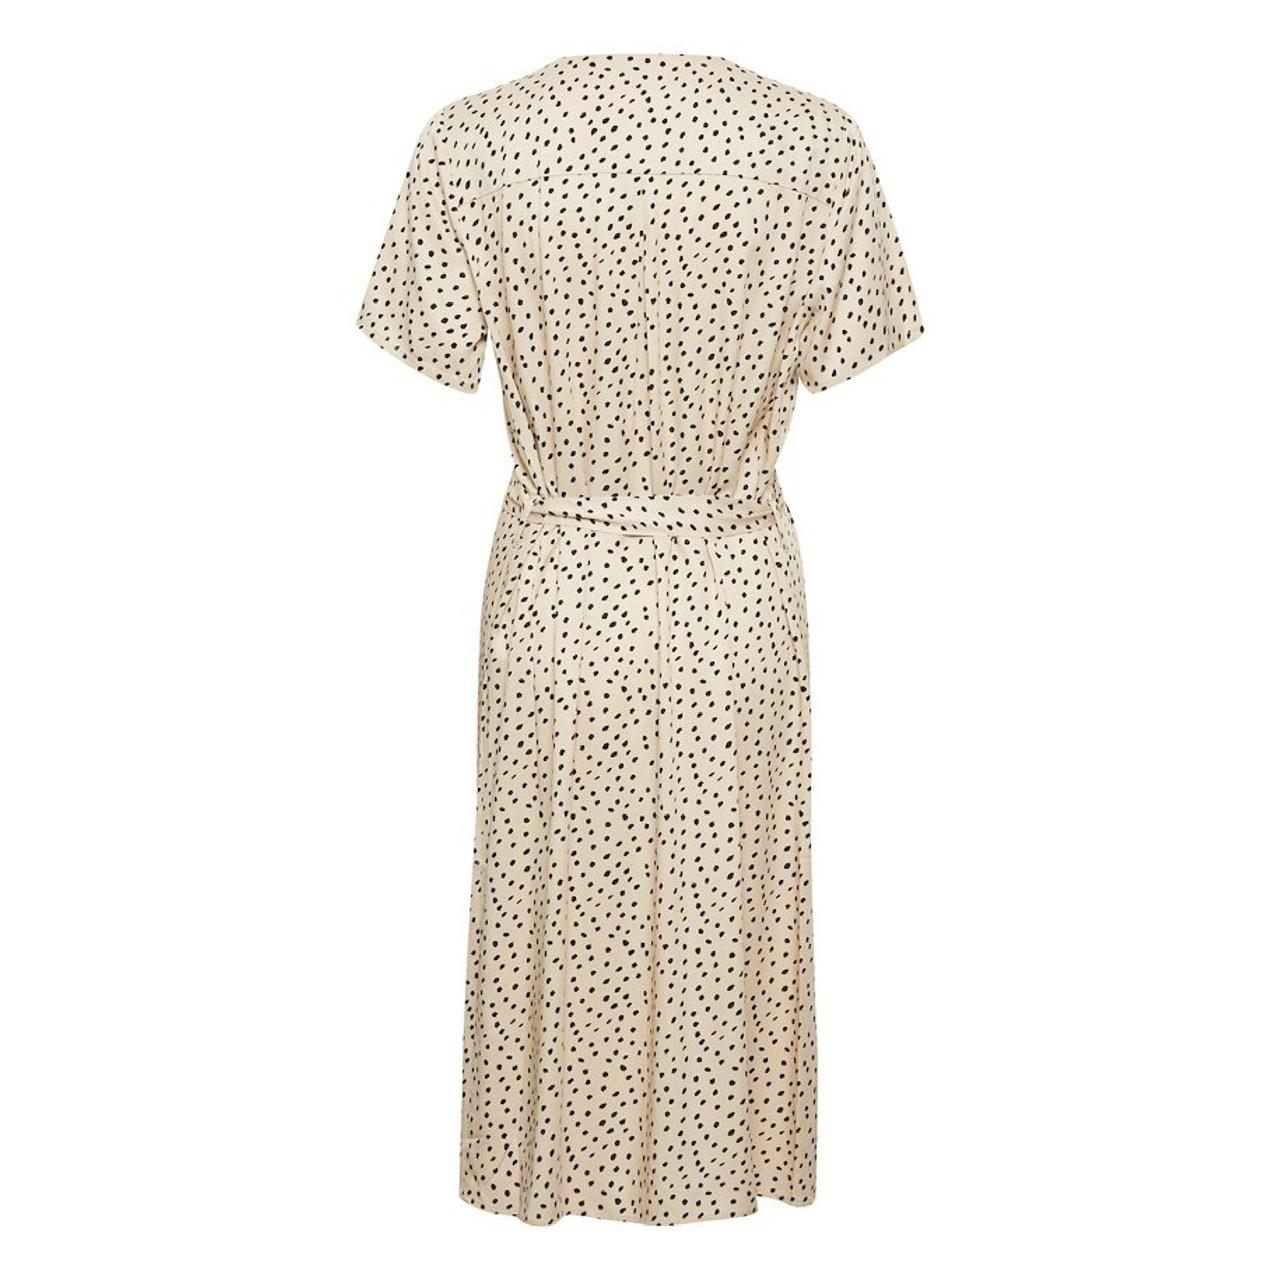 Andrea Dot Print Dress by Saint Tropez